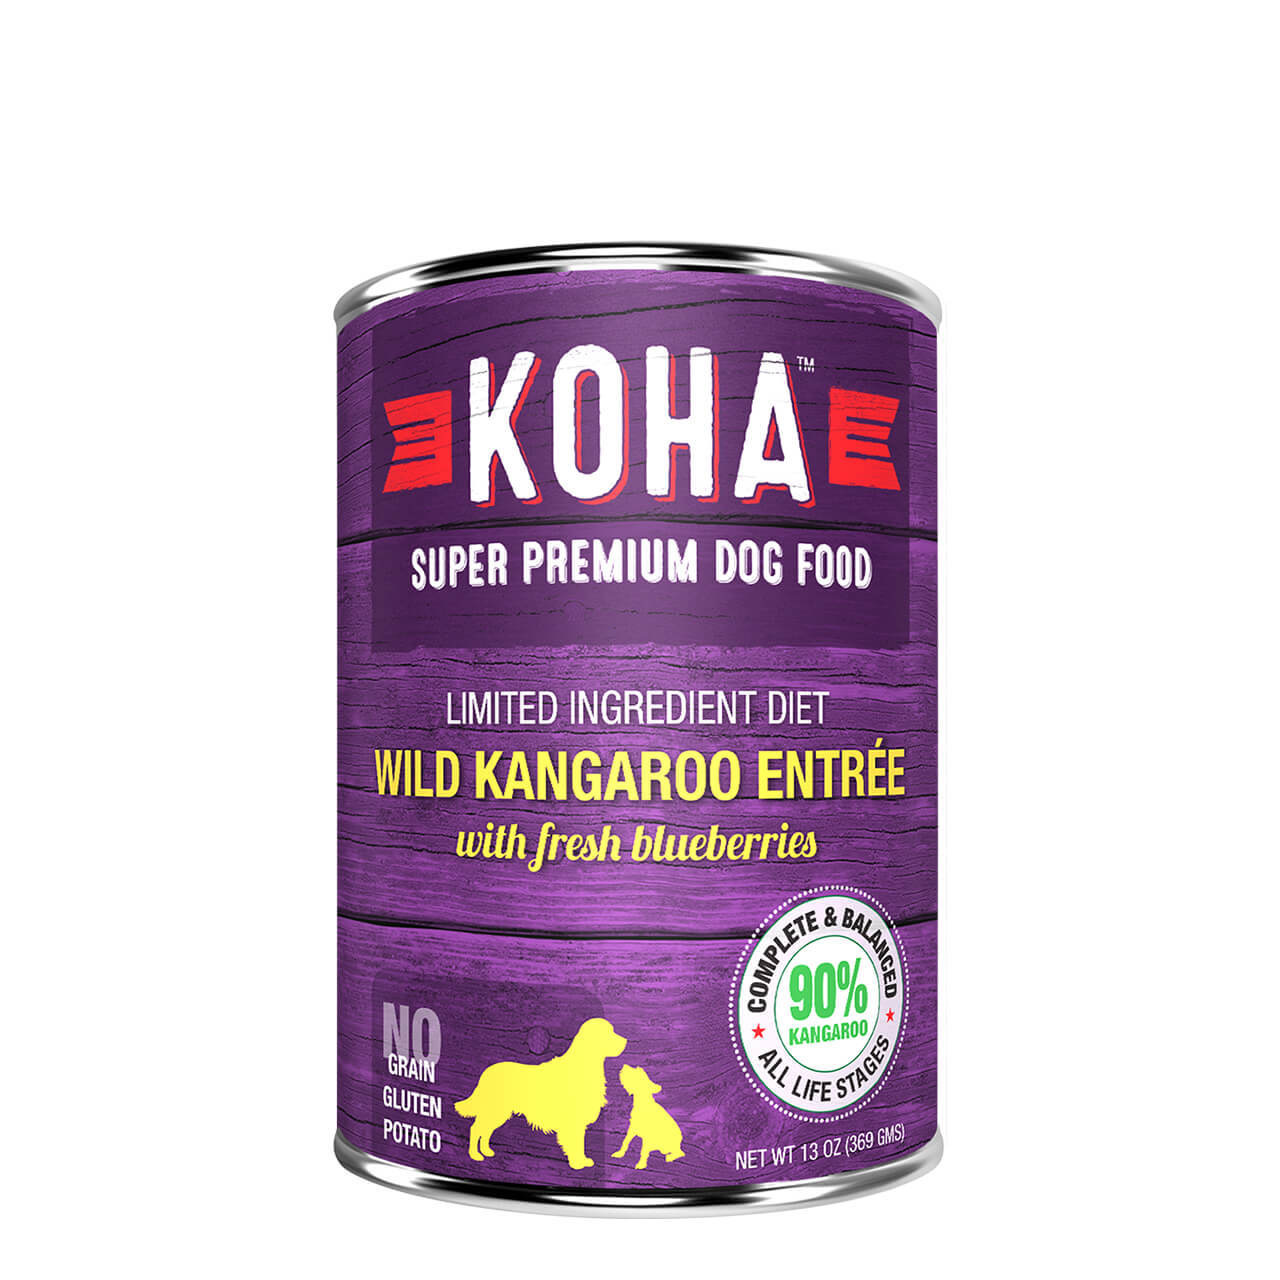 Koha Koha Limited Ingredient Diet Wild Kangaroo Entree